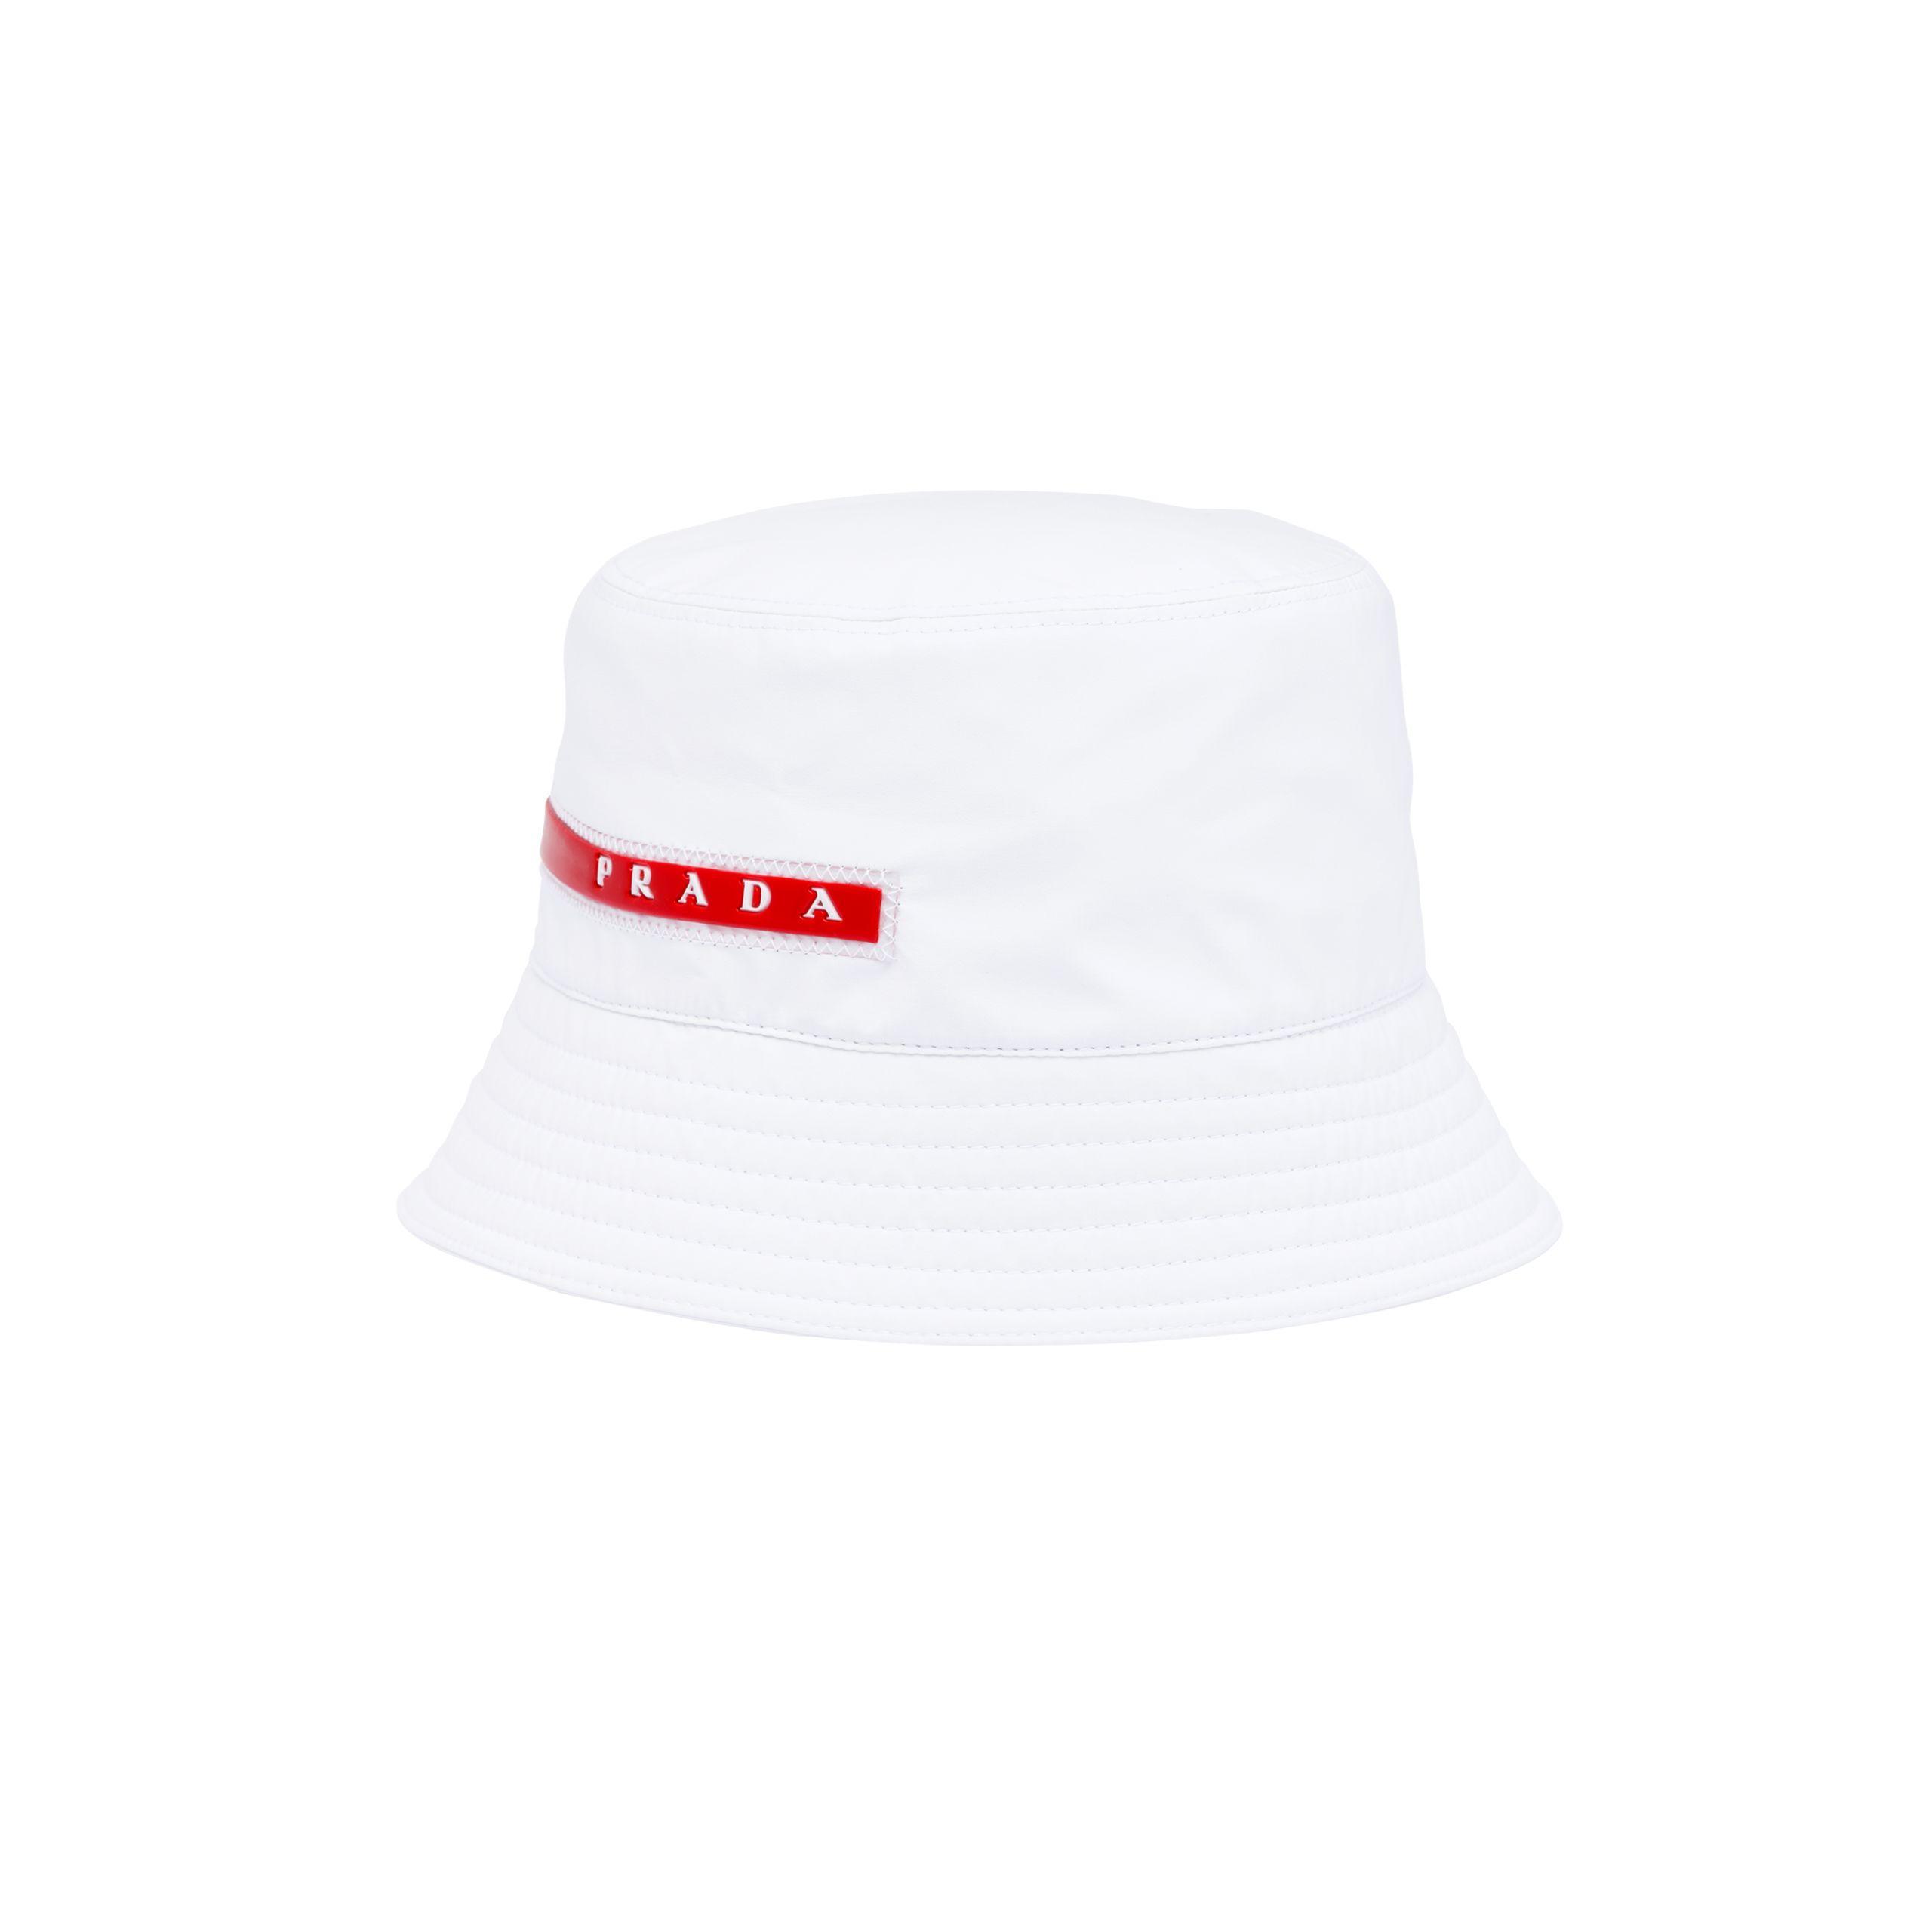 bd865be6194 Lyst - Prada Technical Fabric Cap for Men